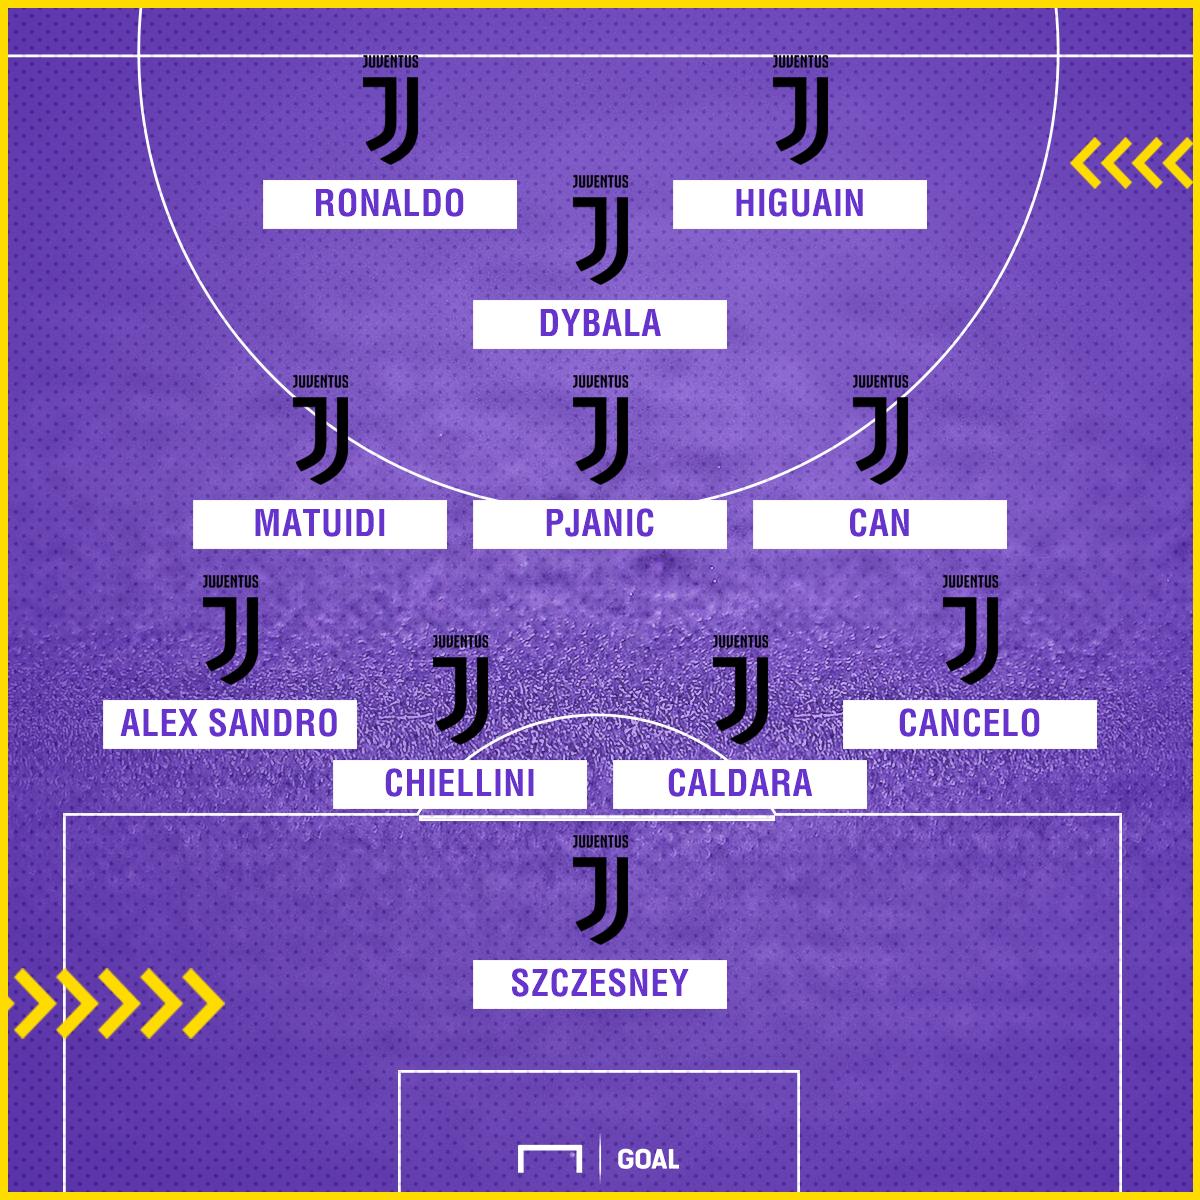 Ronaldo Juventus 4-3-1-2 PS